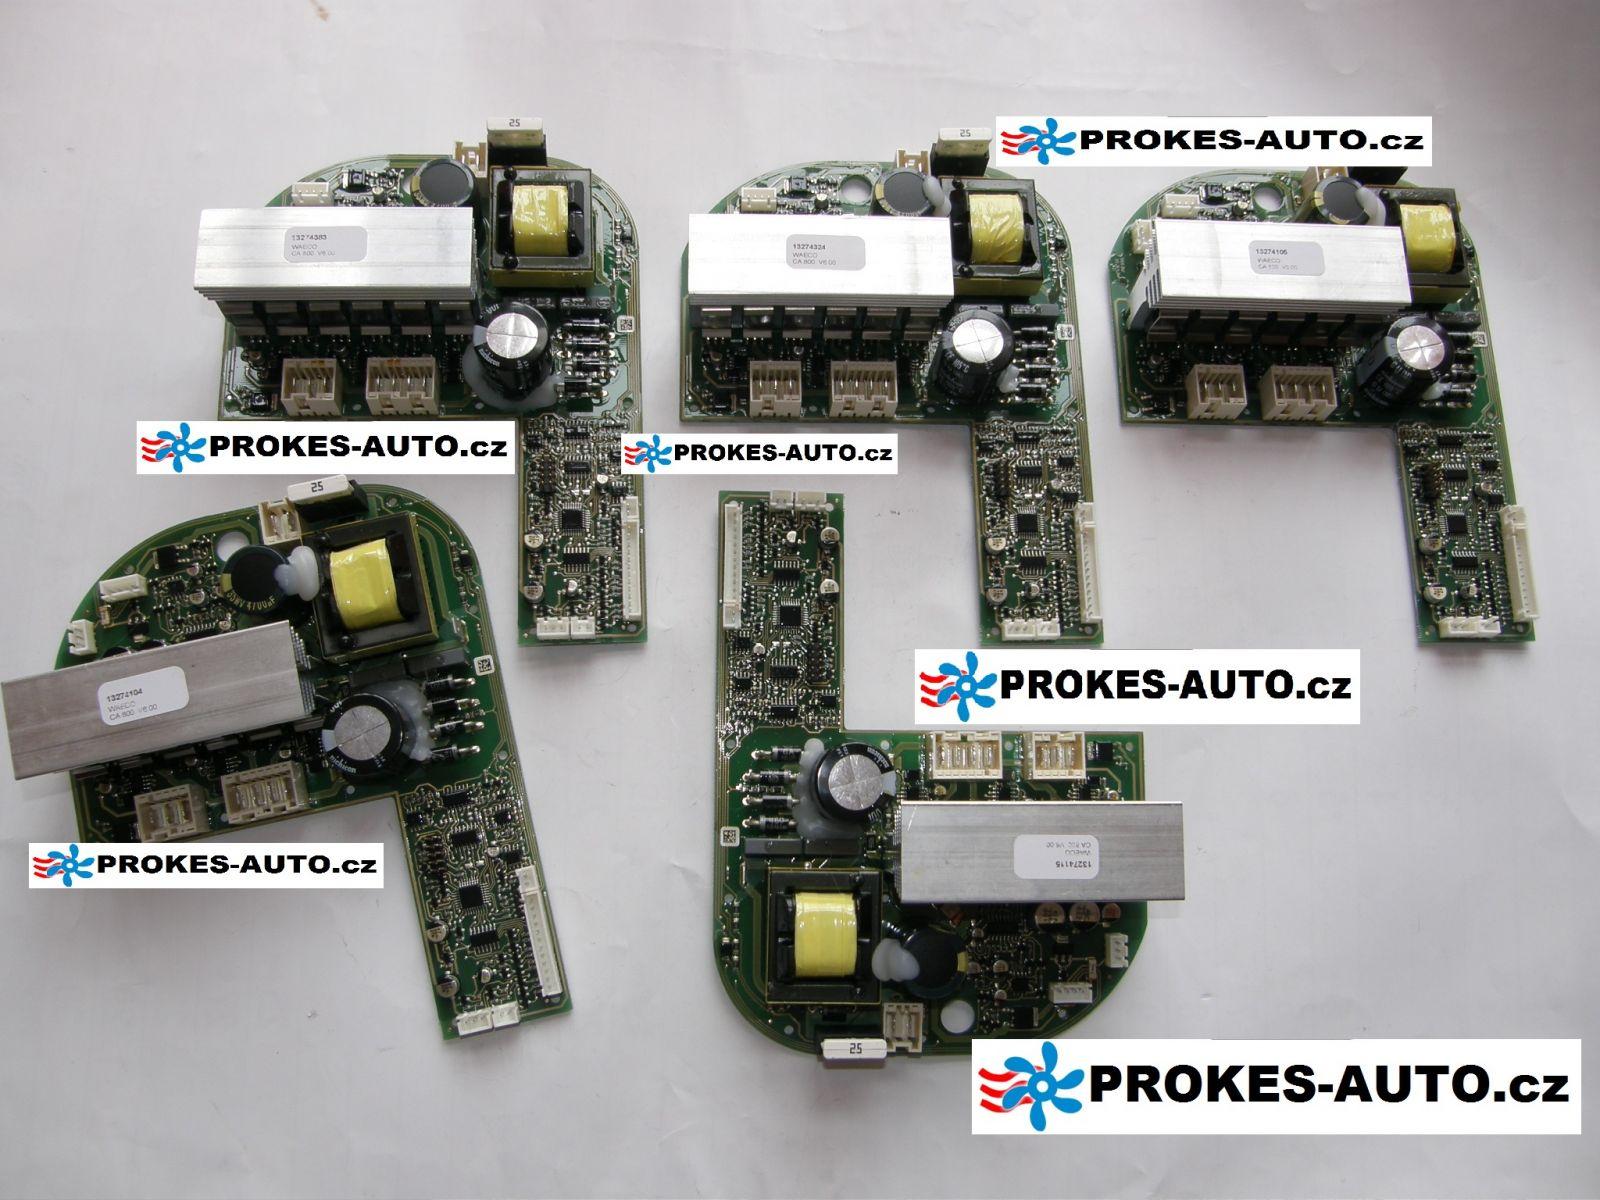 Control unit for Waeco CA800 24V 4441000030 / 4441000146